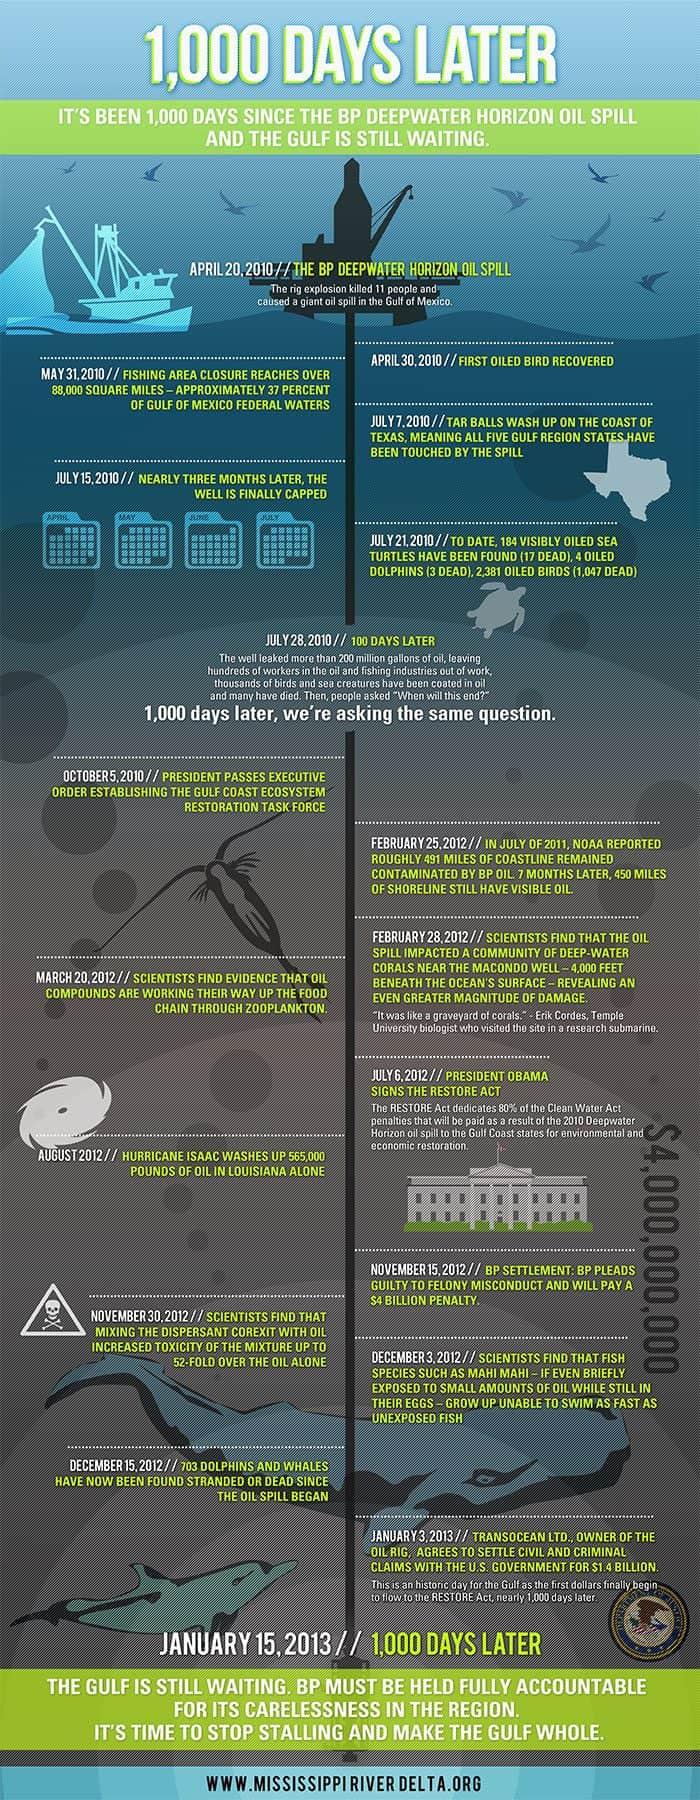 BP Oil Spill 1,000 Days Later Infographic